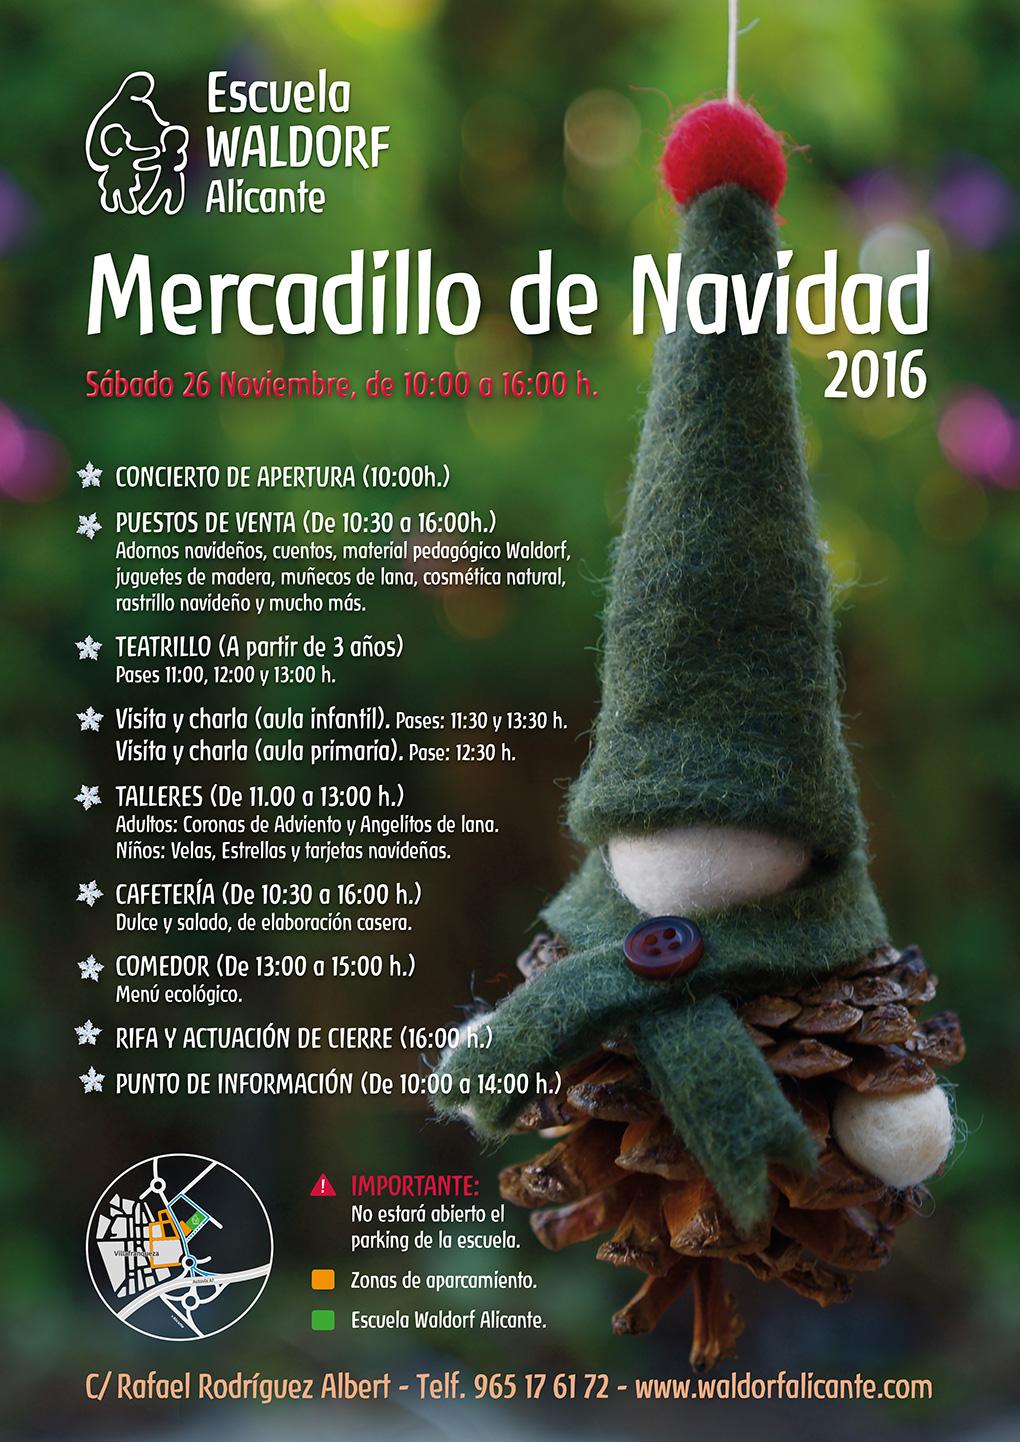 2016-11-ewa-cartel-mercadillo-navidad-web